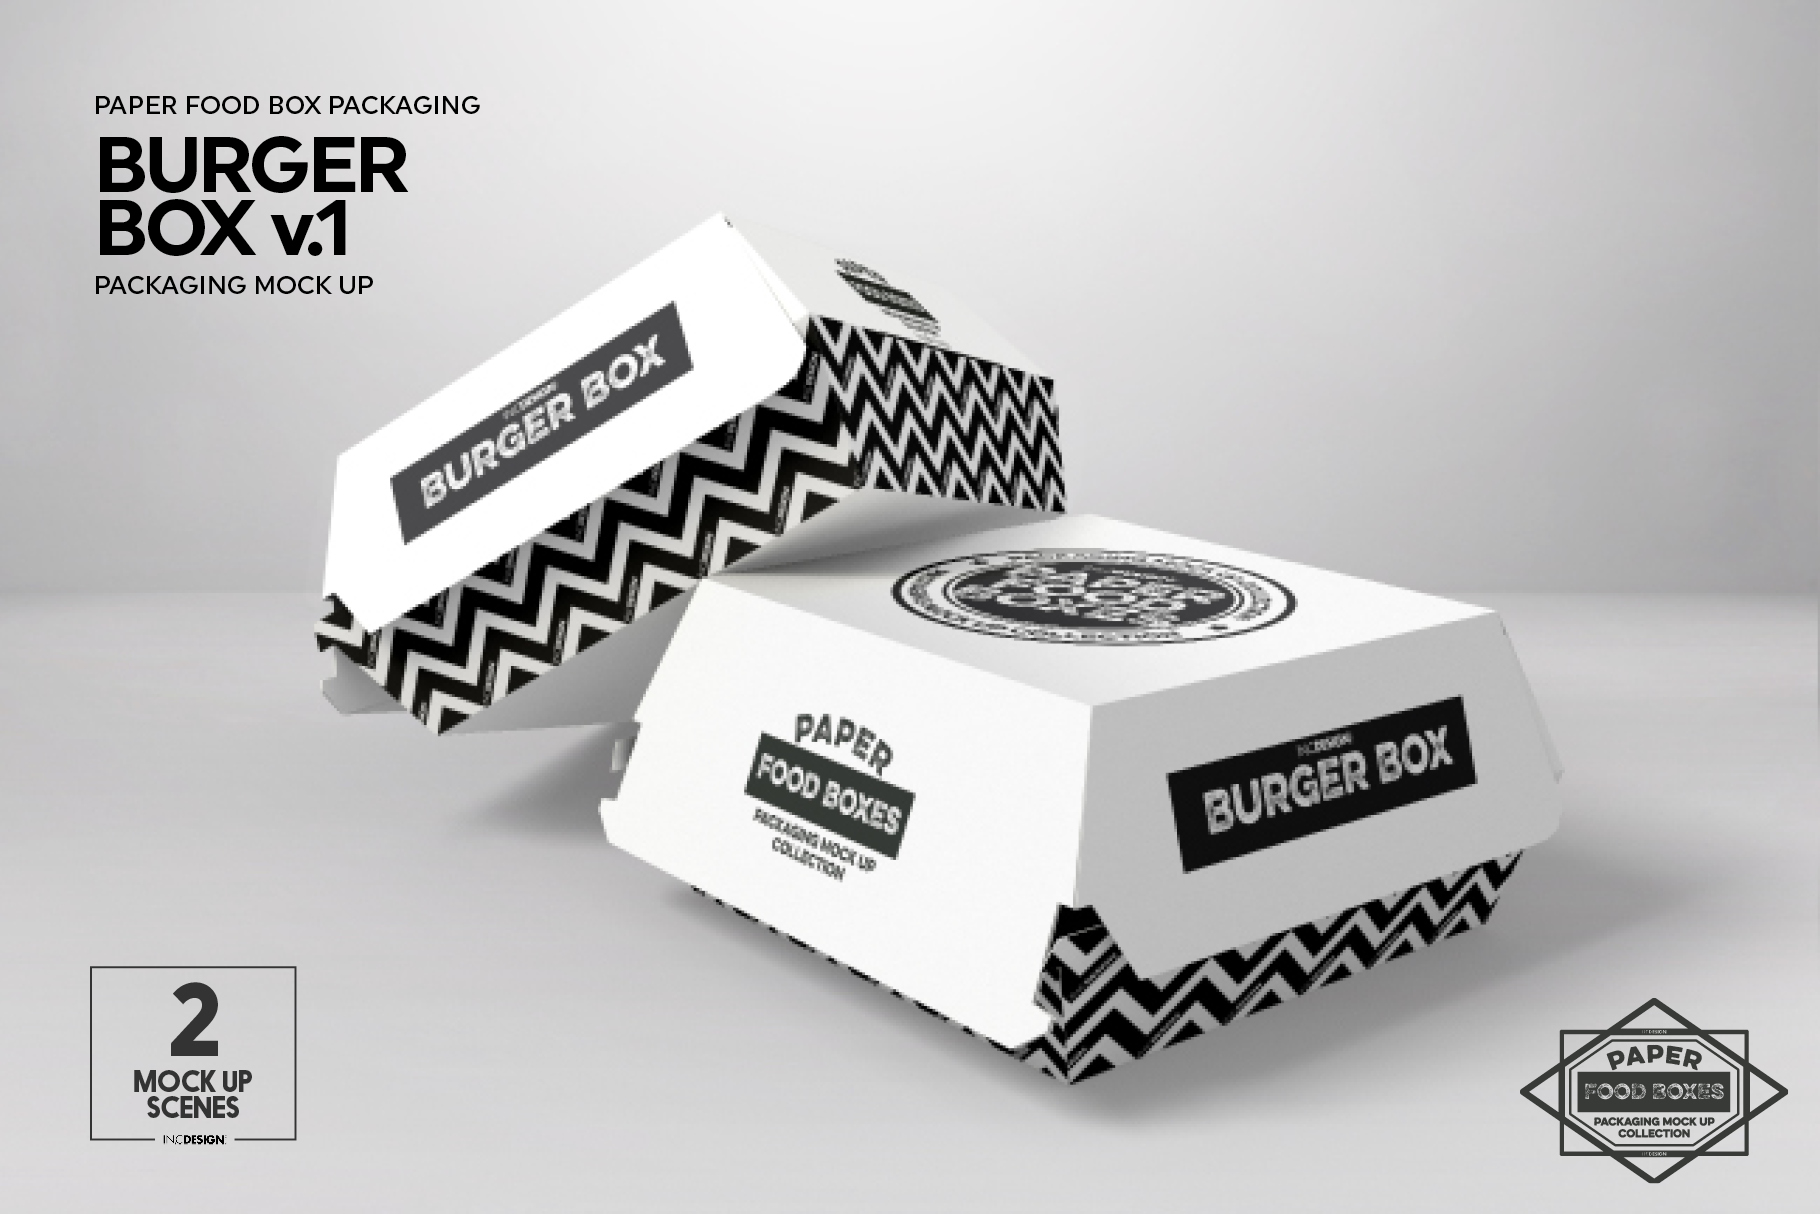 Burger Box Packaging Mock Up v1 example image 3